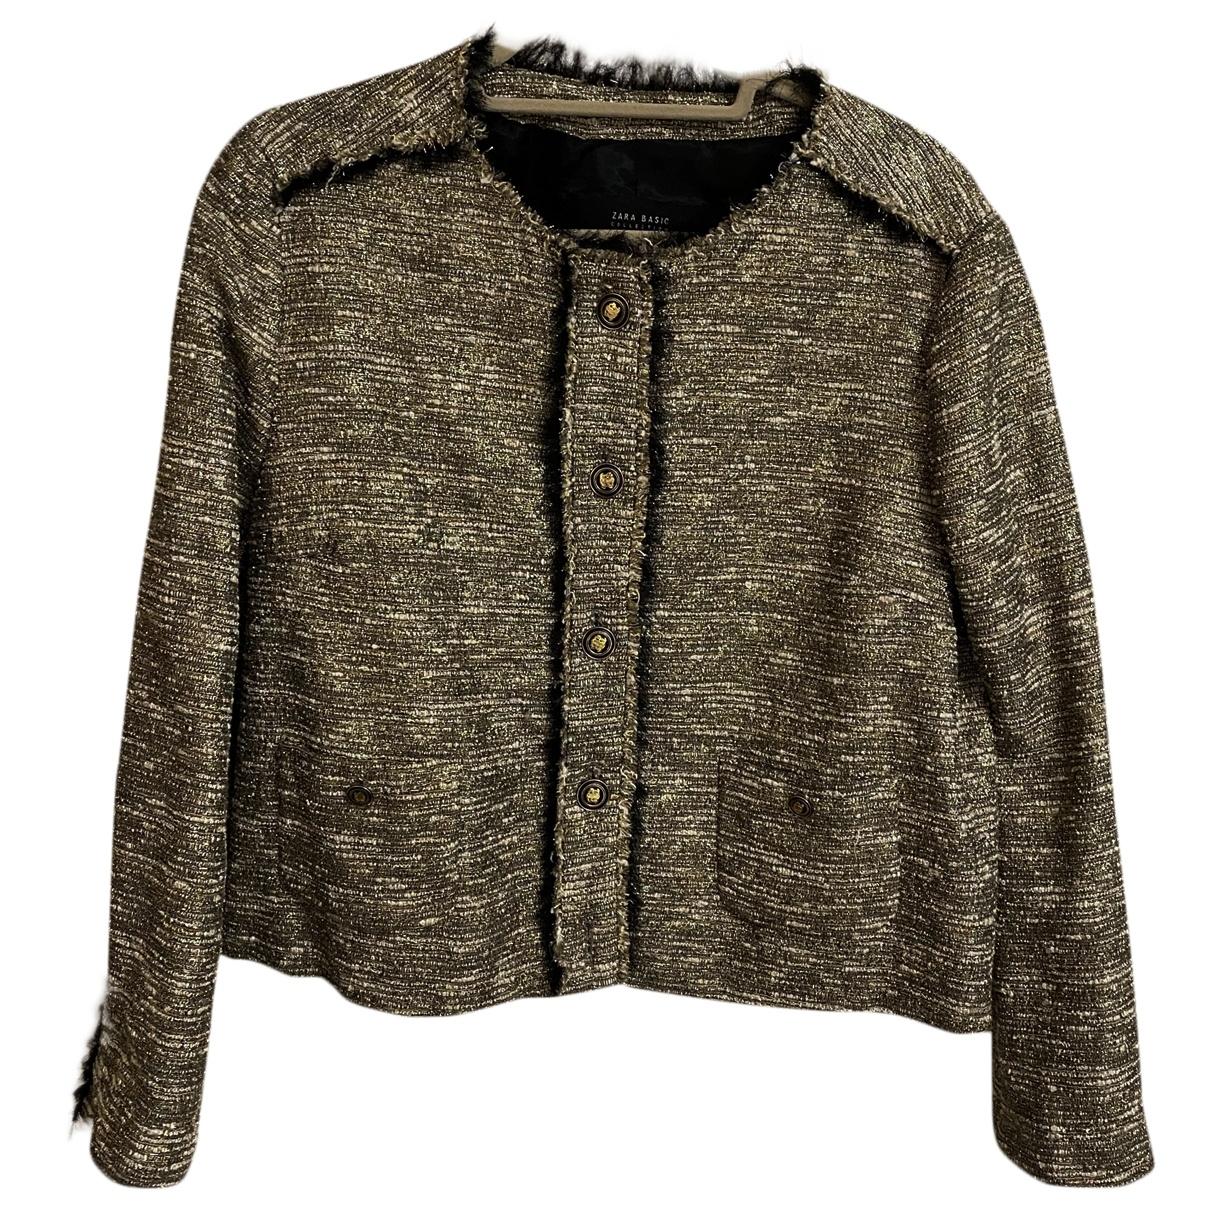 Zara \N Gold Tweed jacket for Women XL International